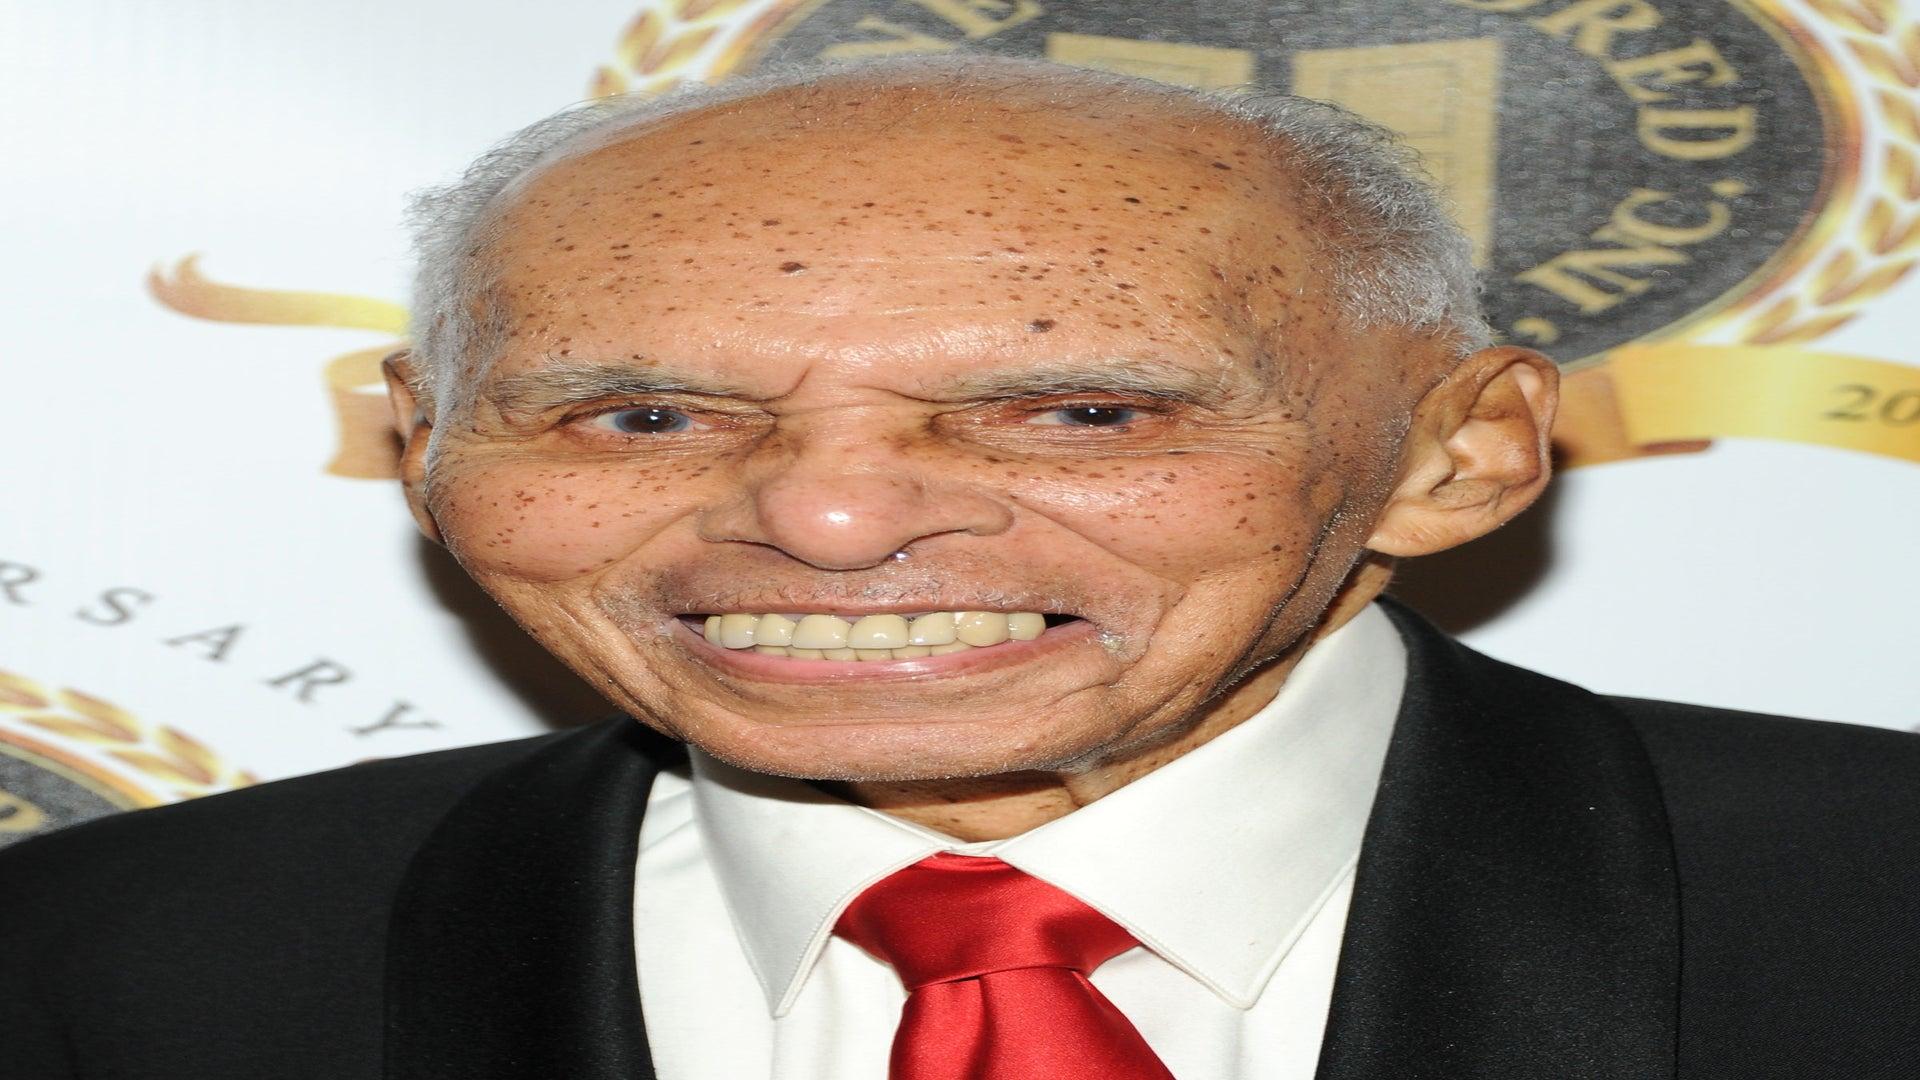 Tuskegee Airman Roscoe Brown Dies at Age 94